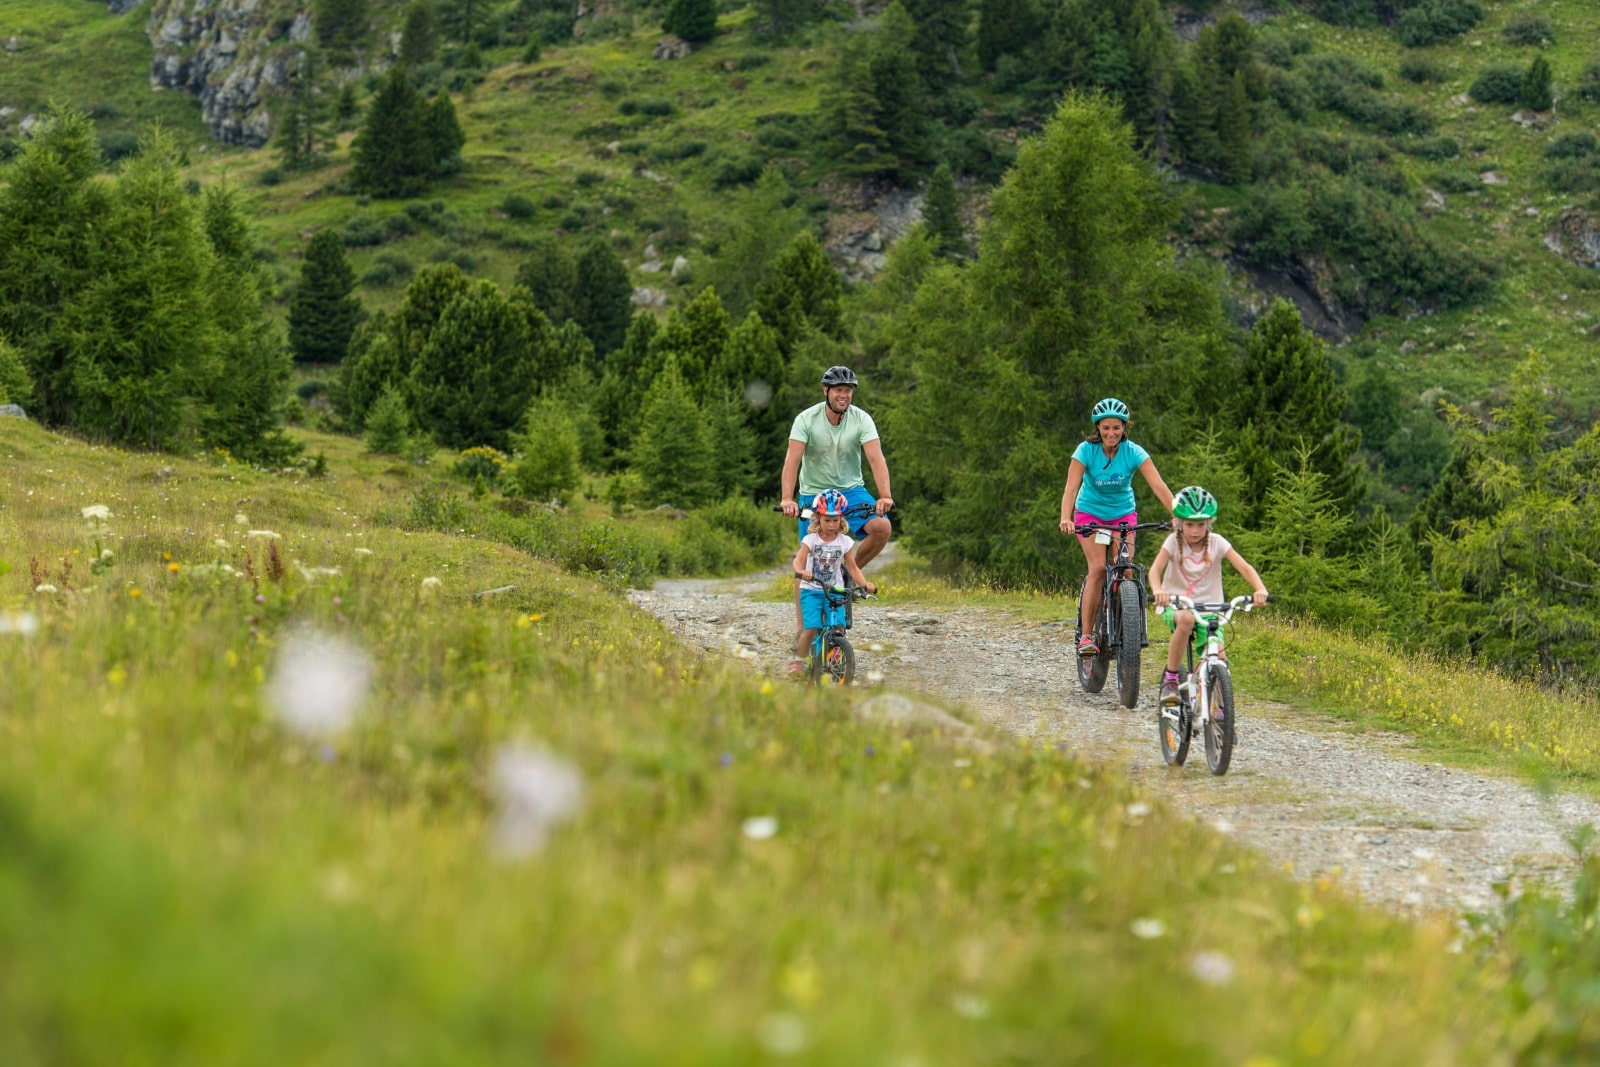 Heidi-Chalet-Falkert-Heidialm-Natur-See-Biken-Fahrrad-Kinder